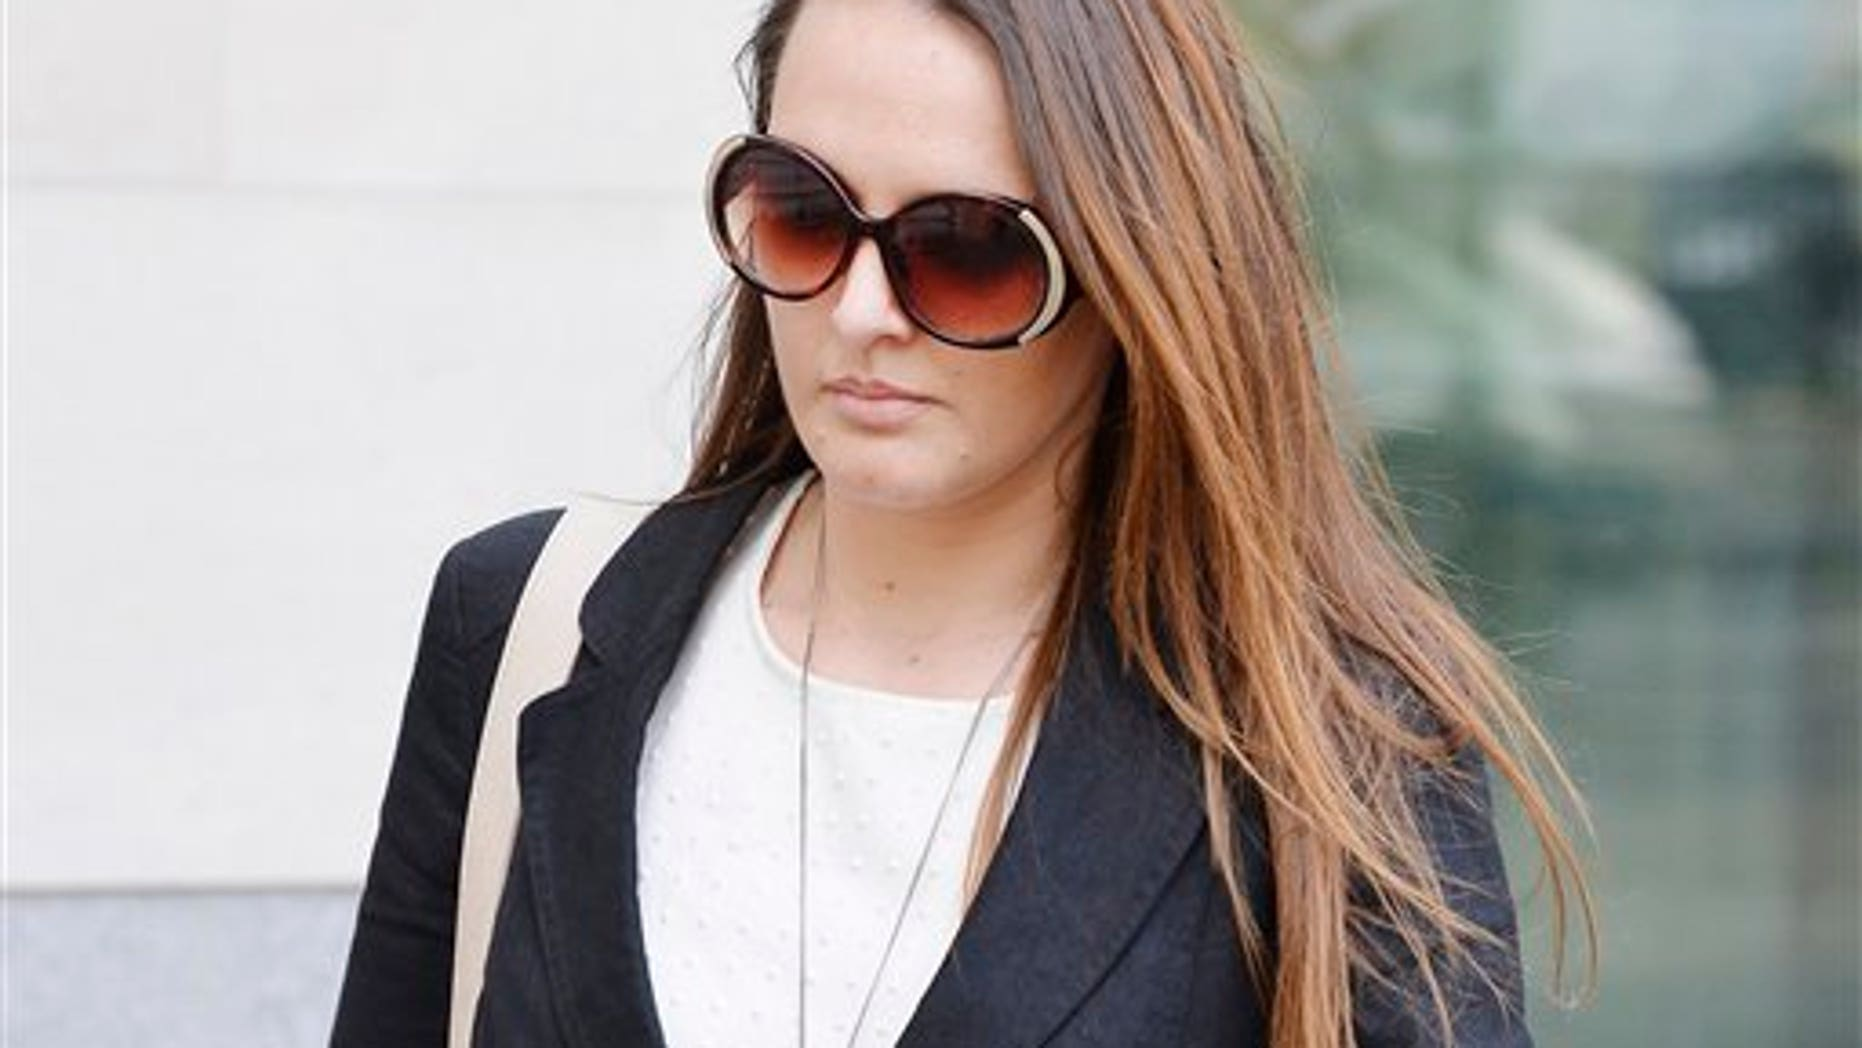 Meerkat expert Caroline Westlake was sentenced in London Wednesday. (John Stillwell/PA via AP)